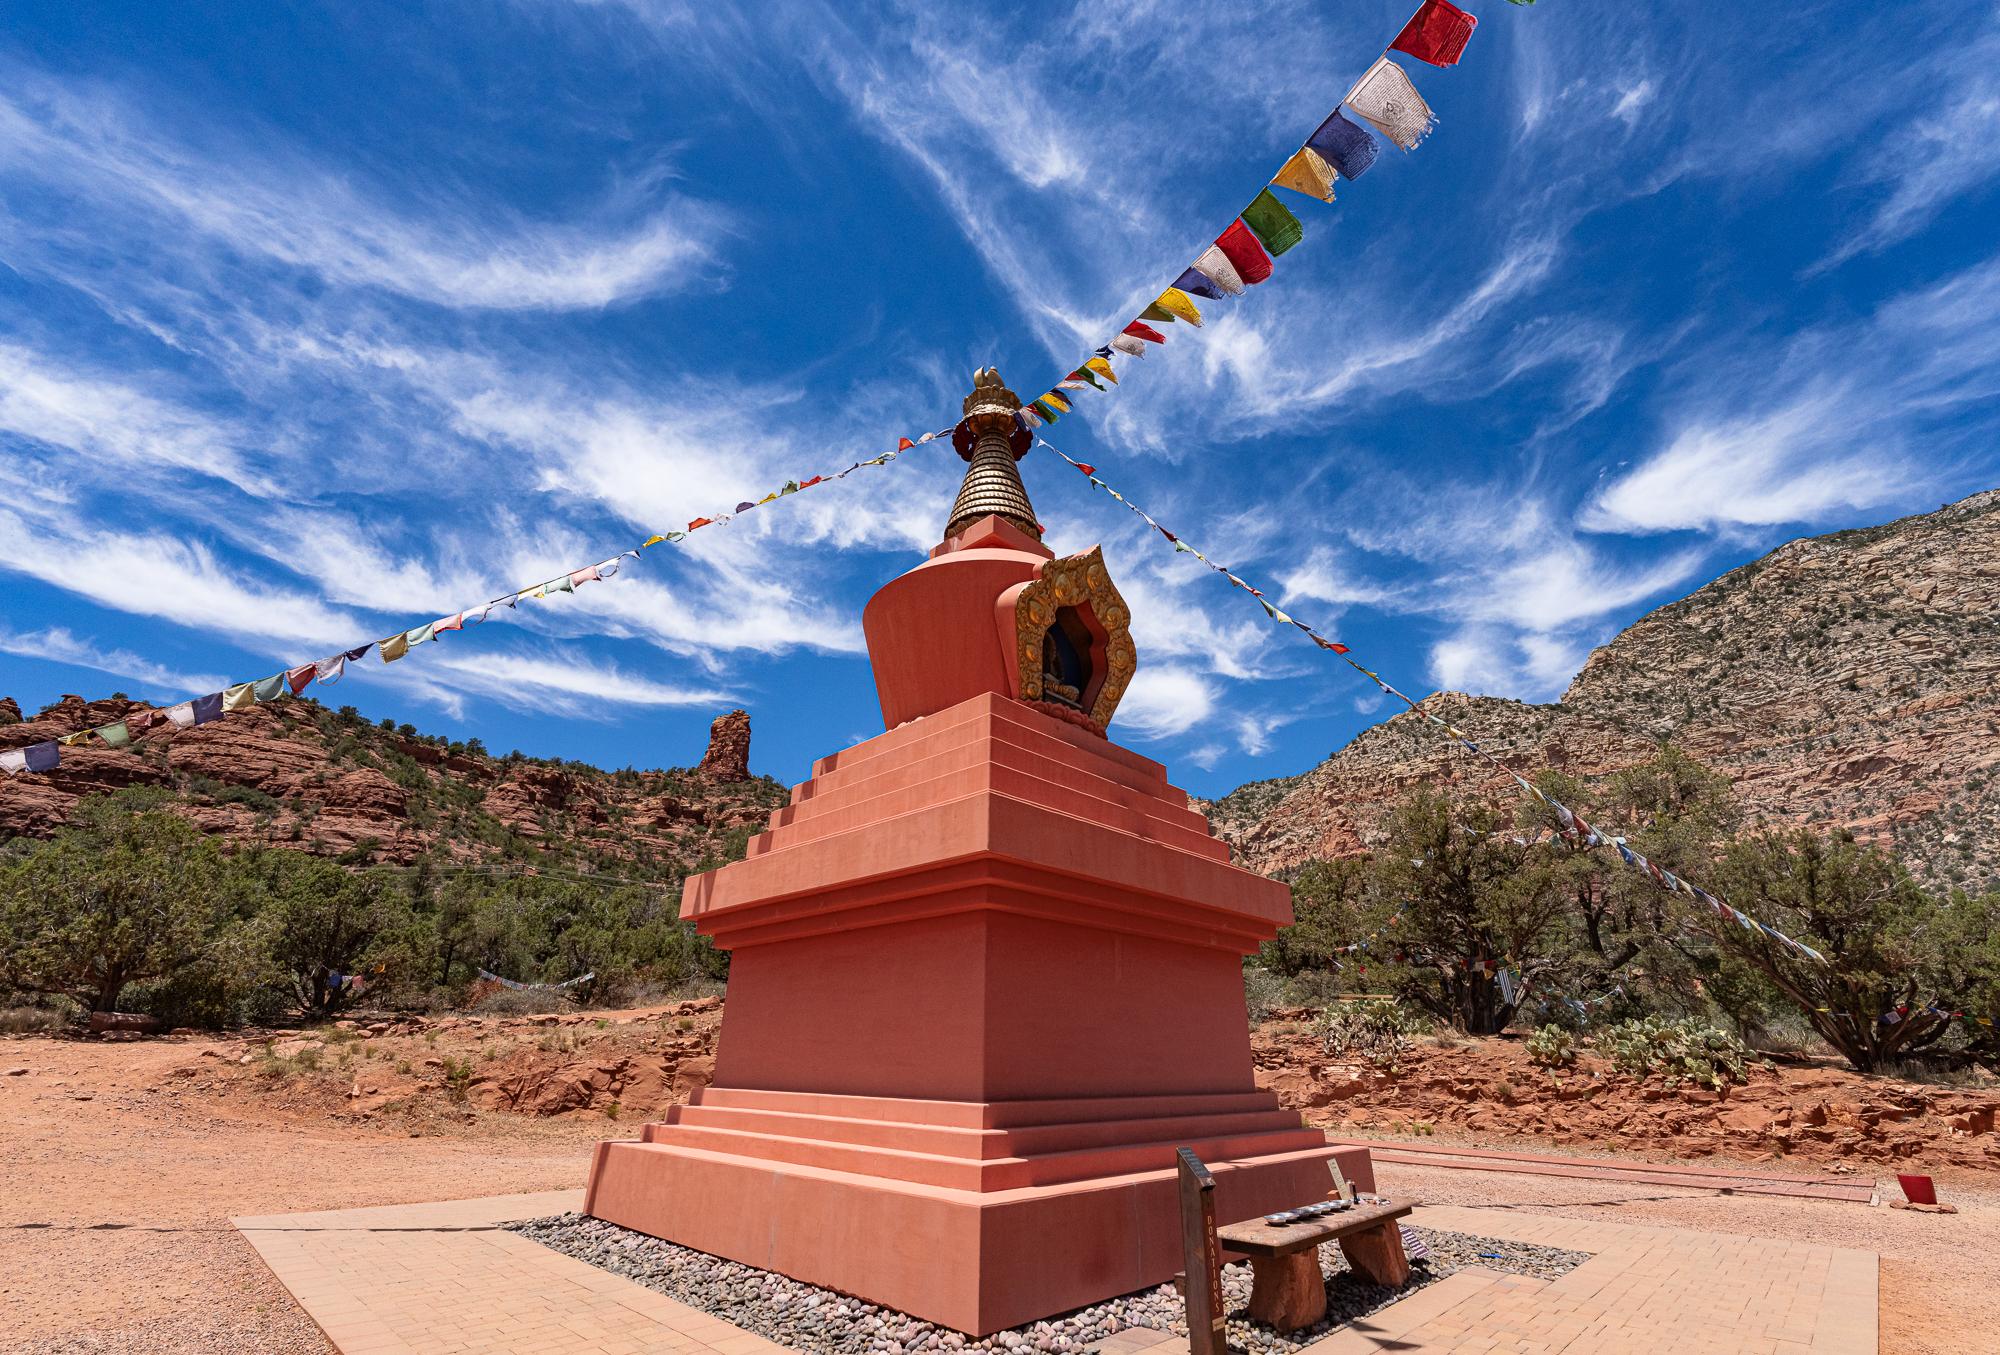 Amitabha Buddhist Stupa, Sedona, AZ